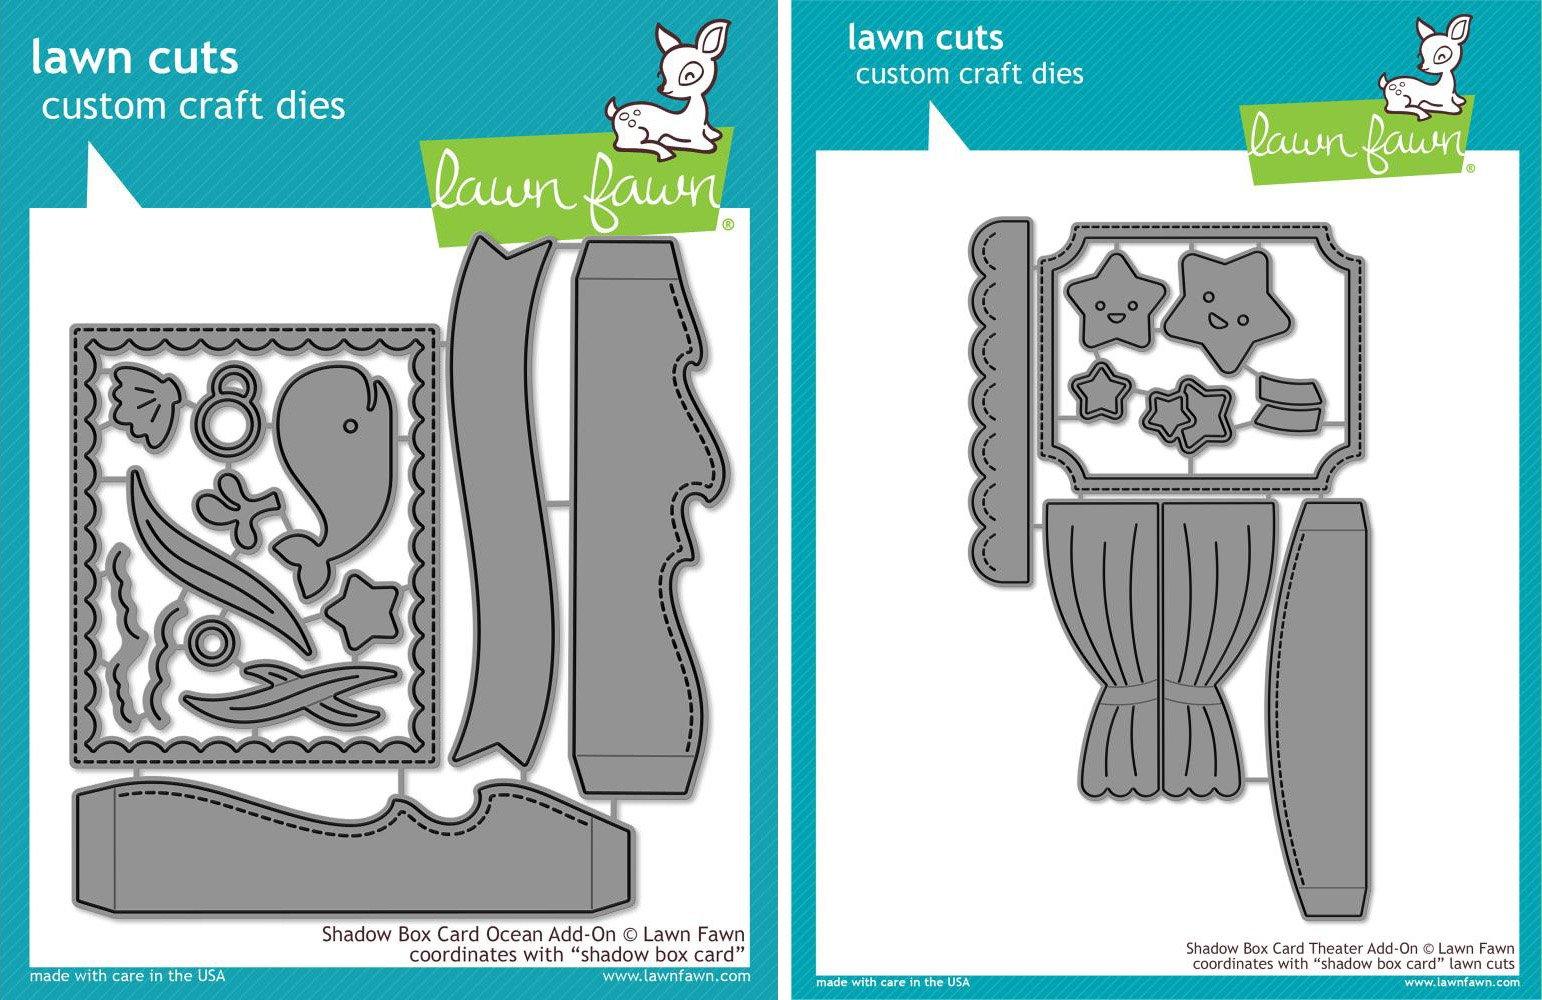 Lawn Fawn - Lawn Cut Dies - Shadow Box Ocean Add-On Dies and Shadow Box Theater Dies - 2 Item Bundle